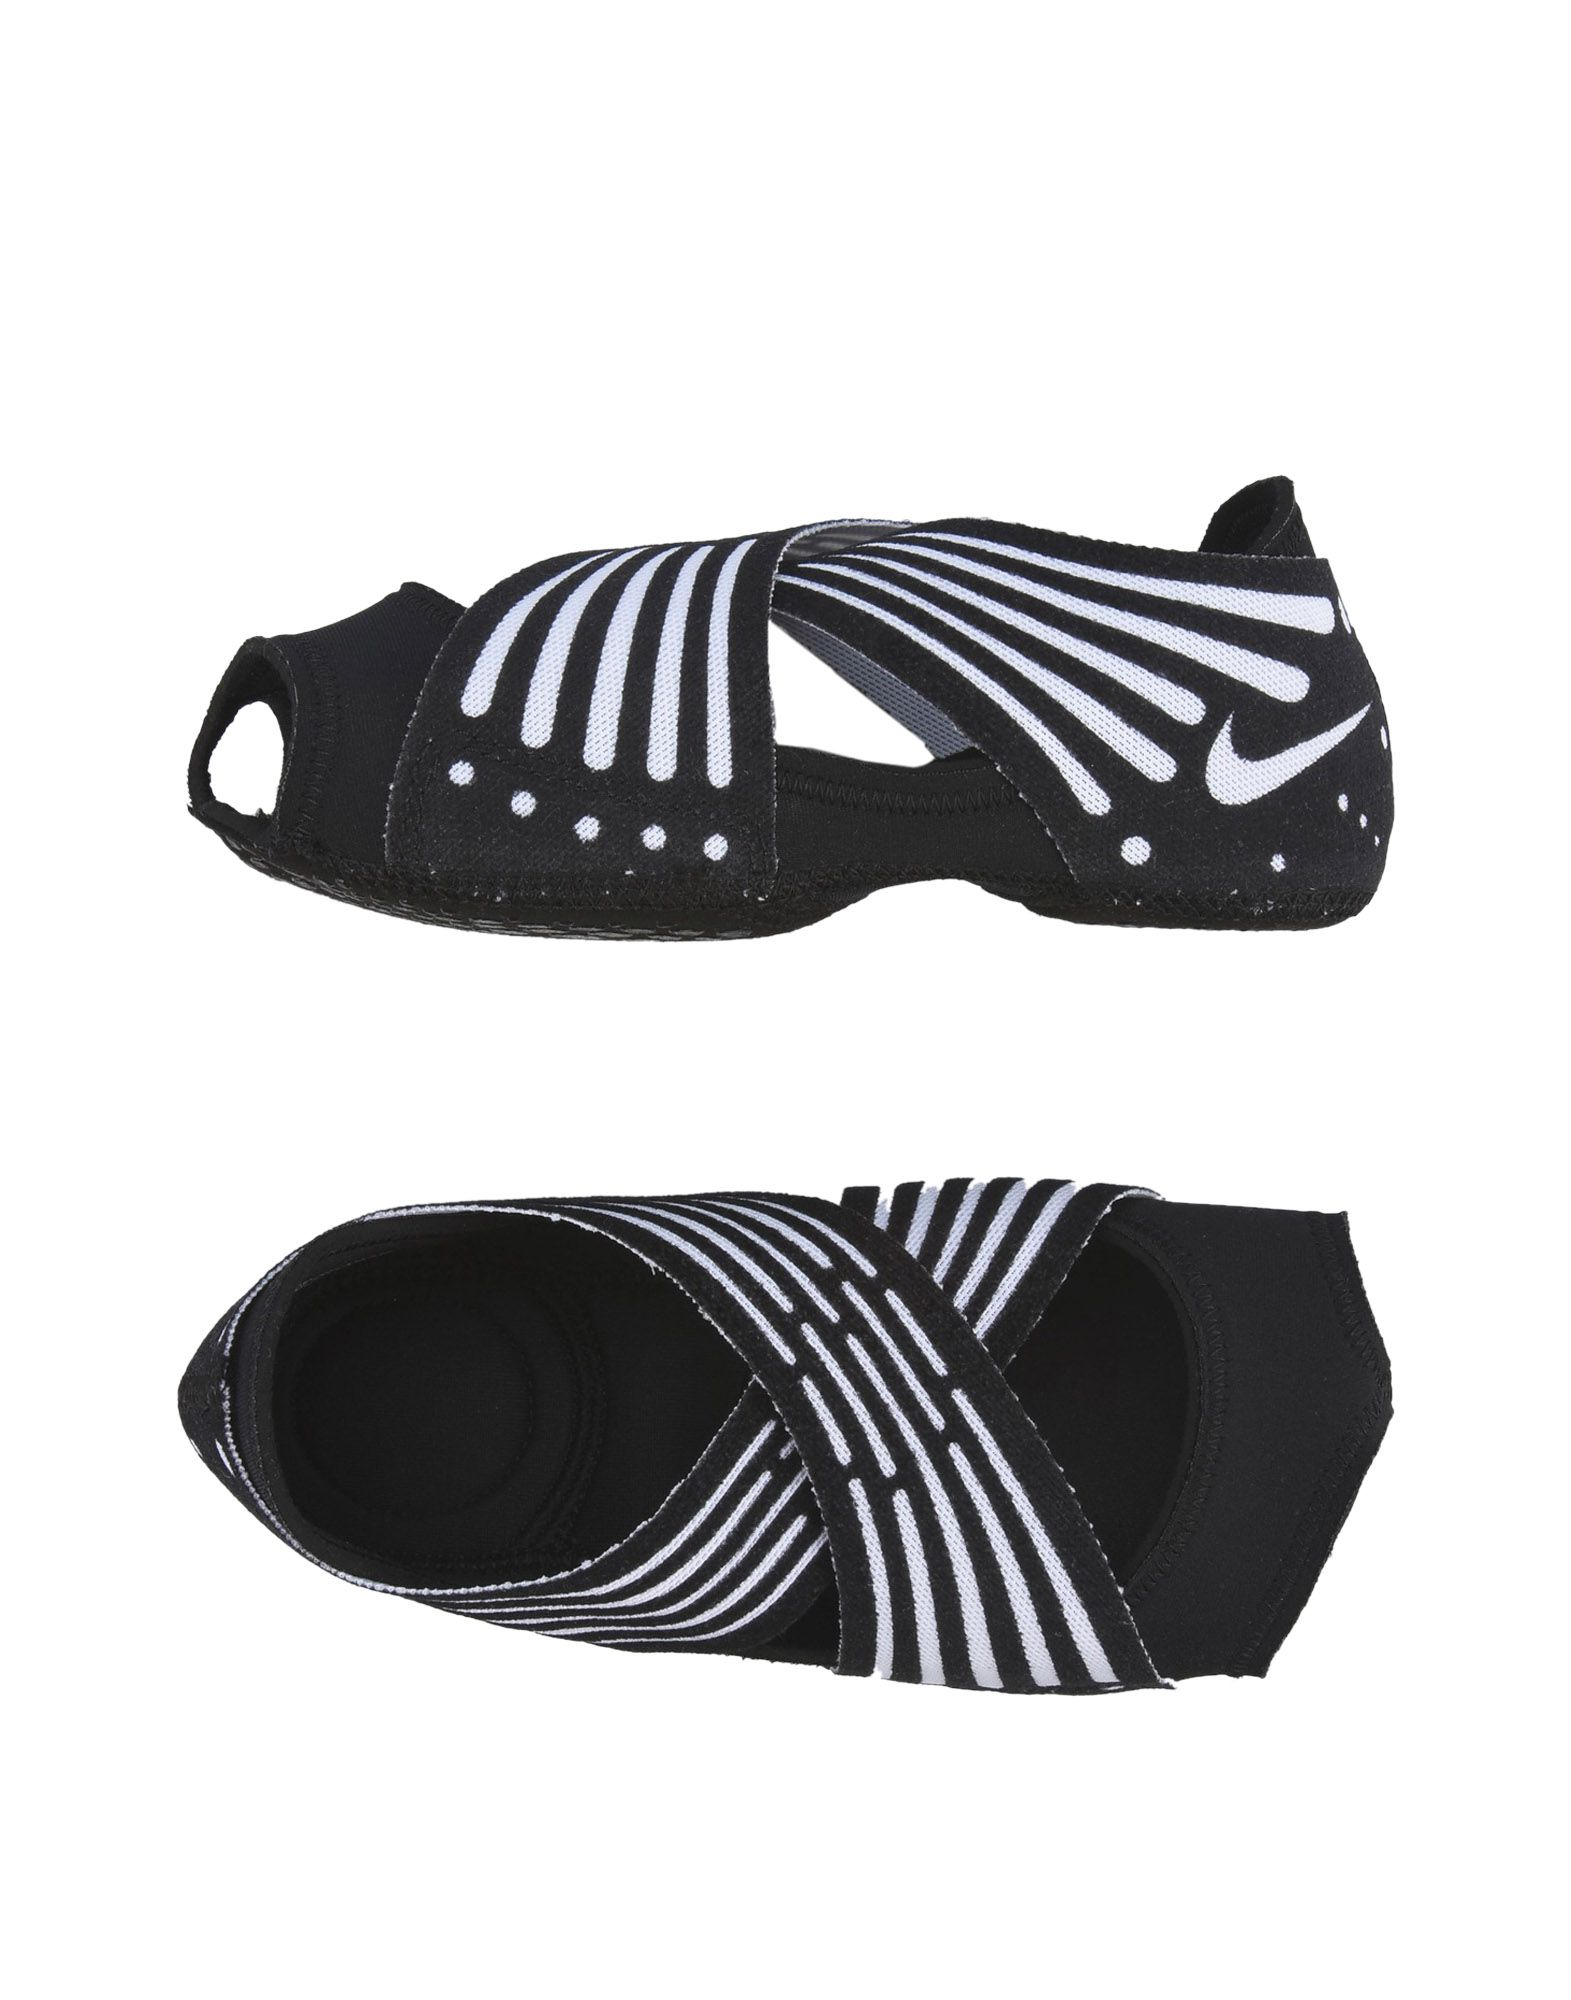 Sneakers Nike  Studio Wrap 4 - Donna - 11229326CI